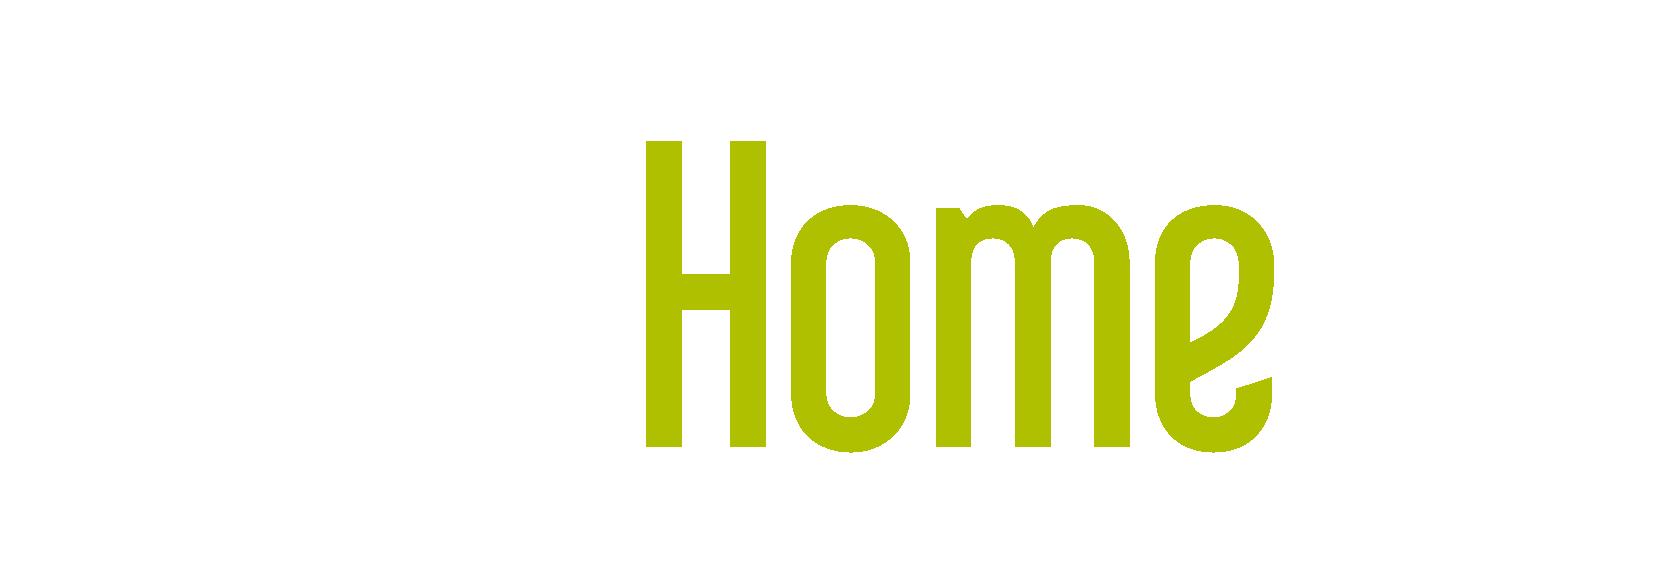 homelife-logo-rgb-2016-final-aw2